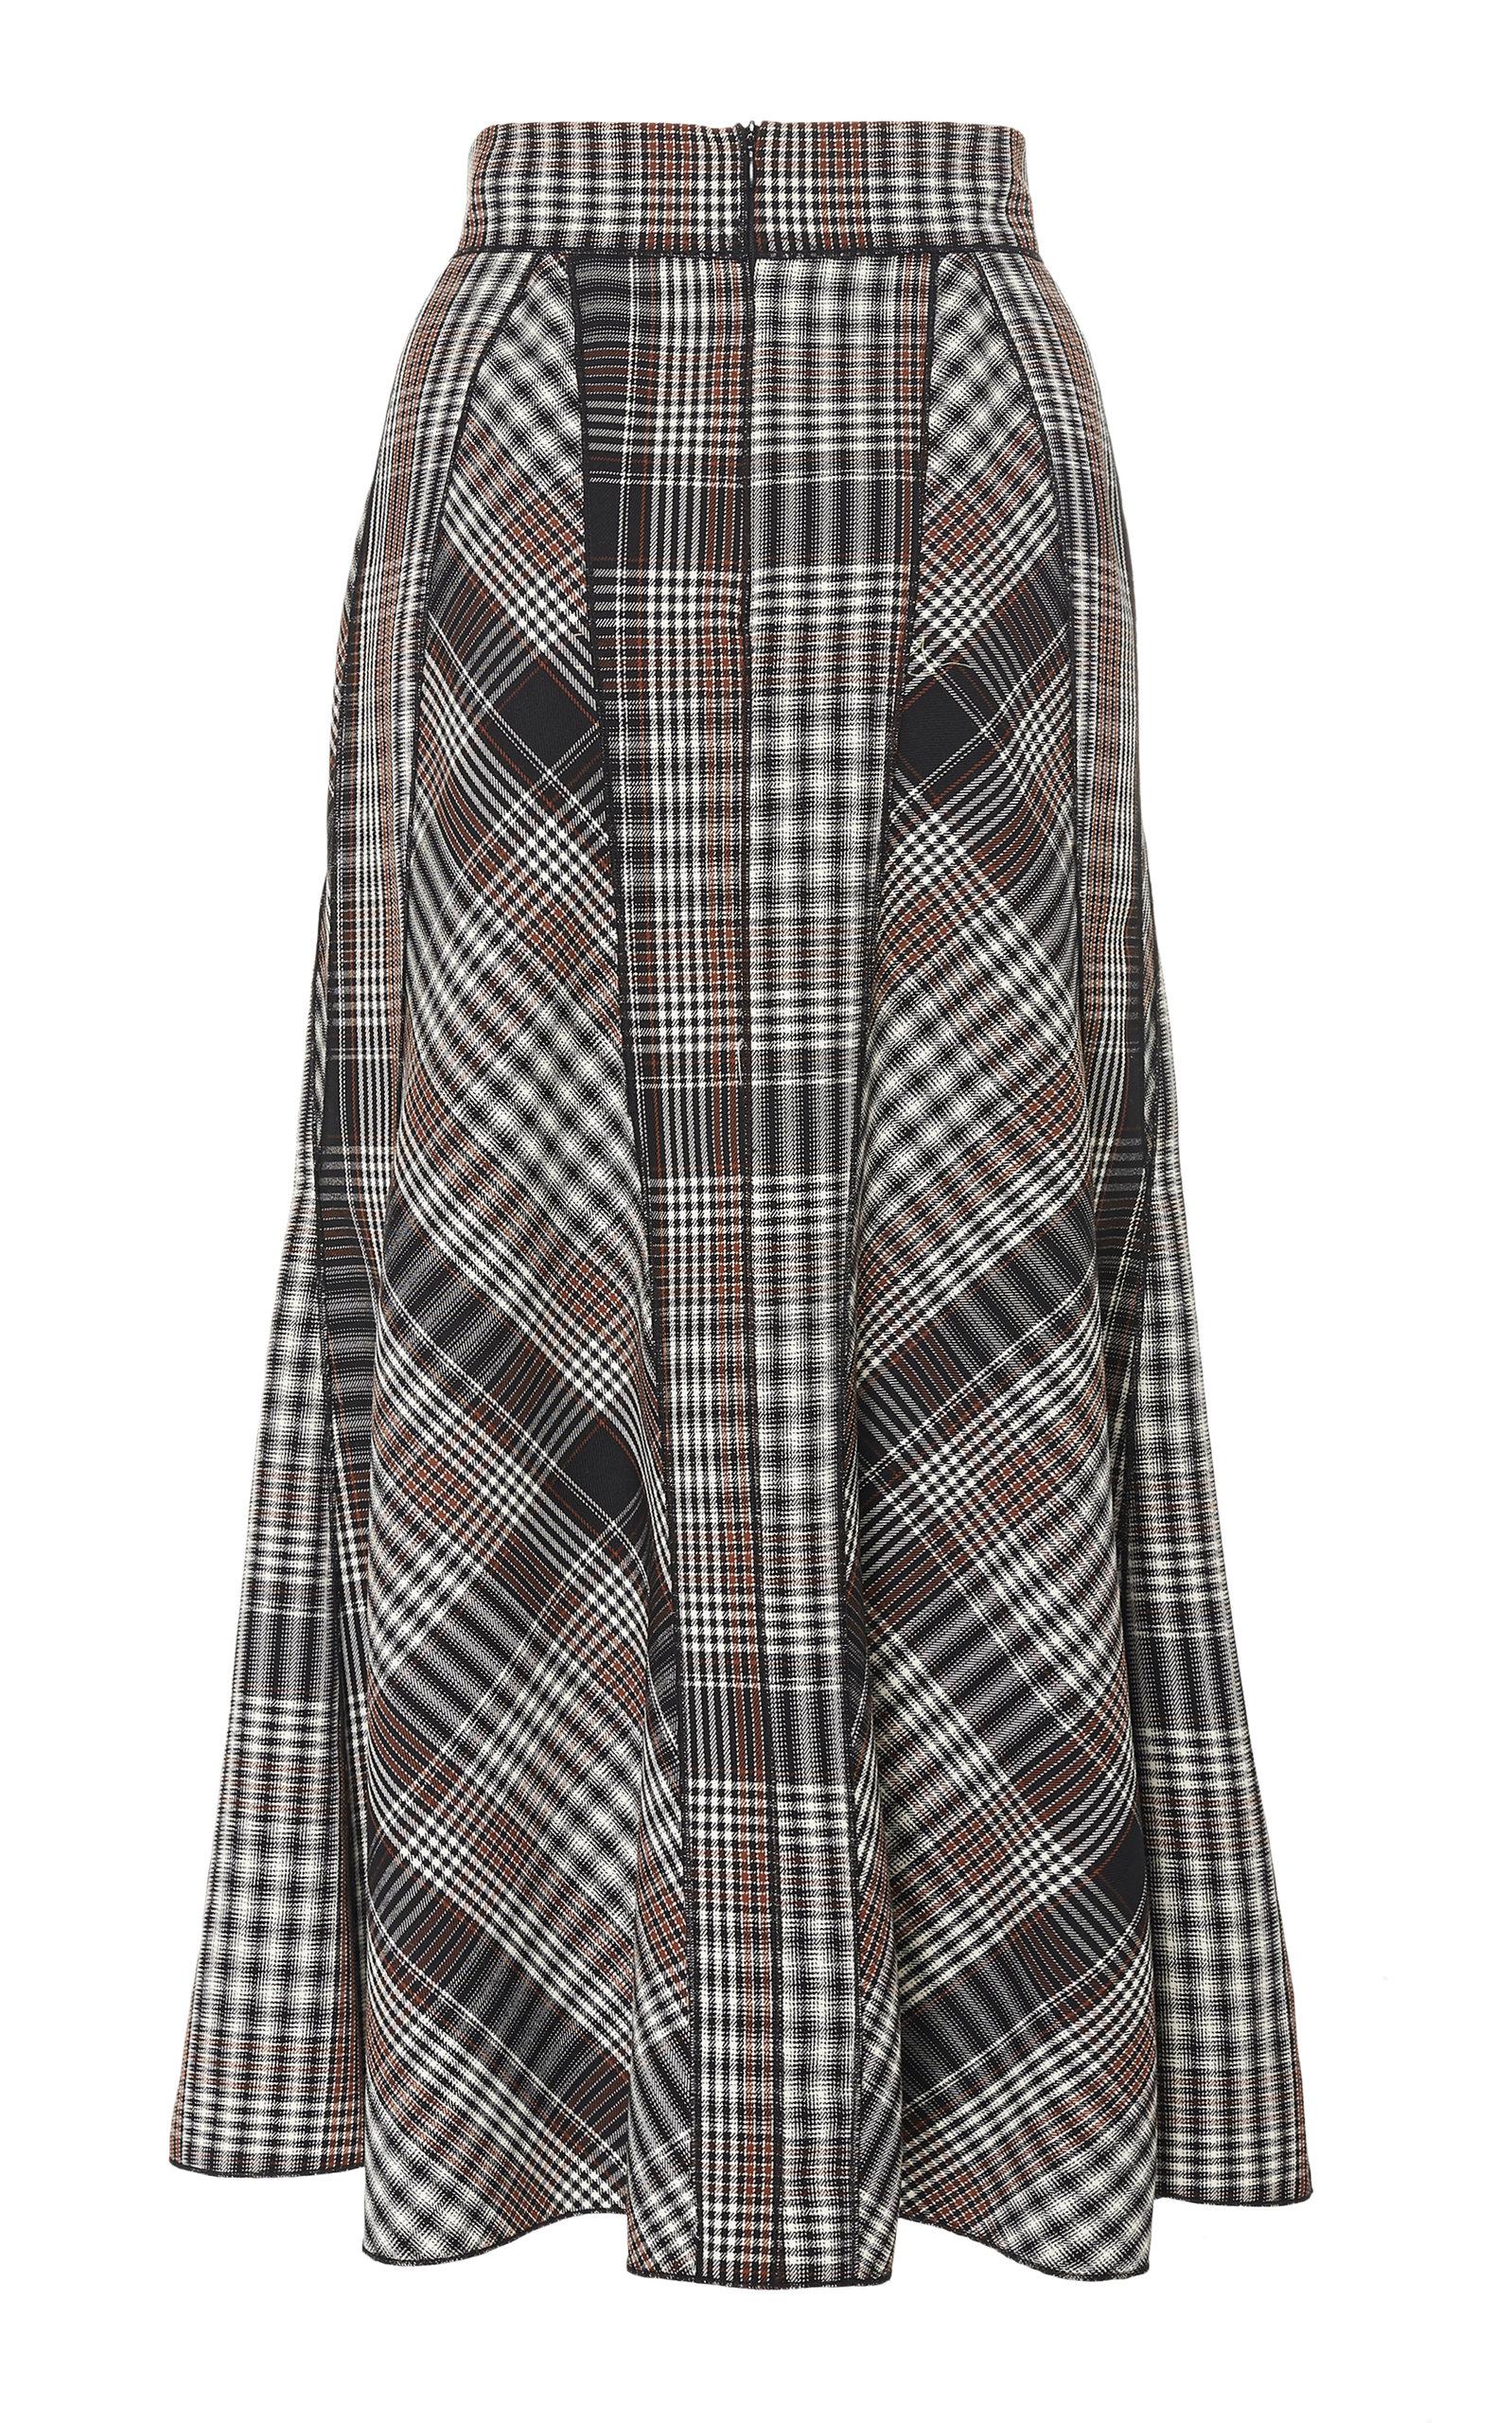 6ecb2e7895 Pleated Plaid Virgin Wool Skirt by Derek Lam   Moda Operandi